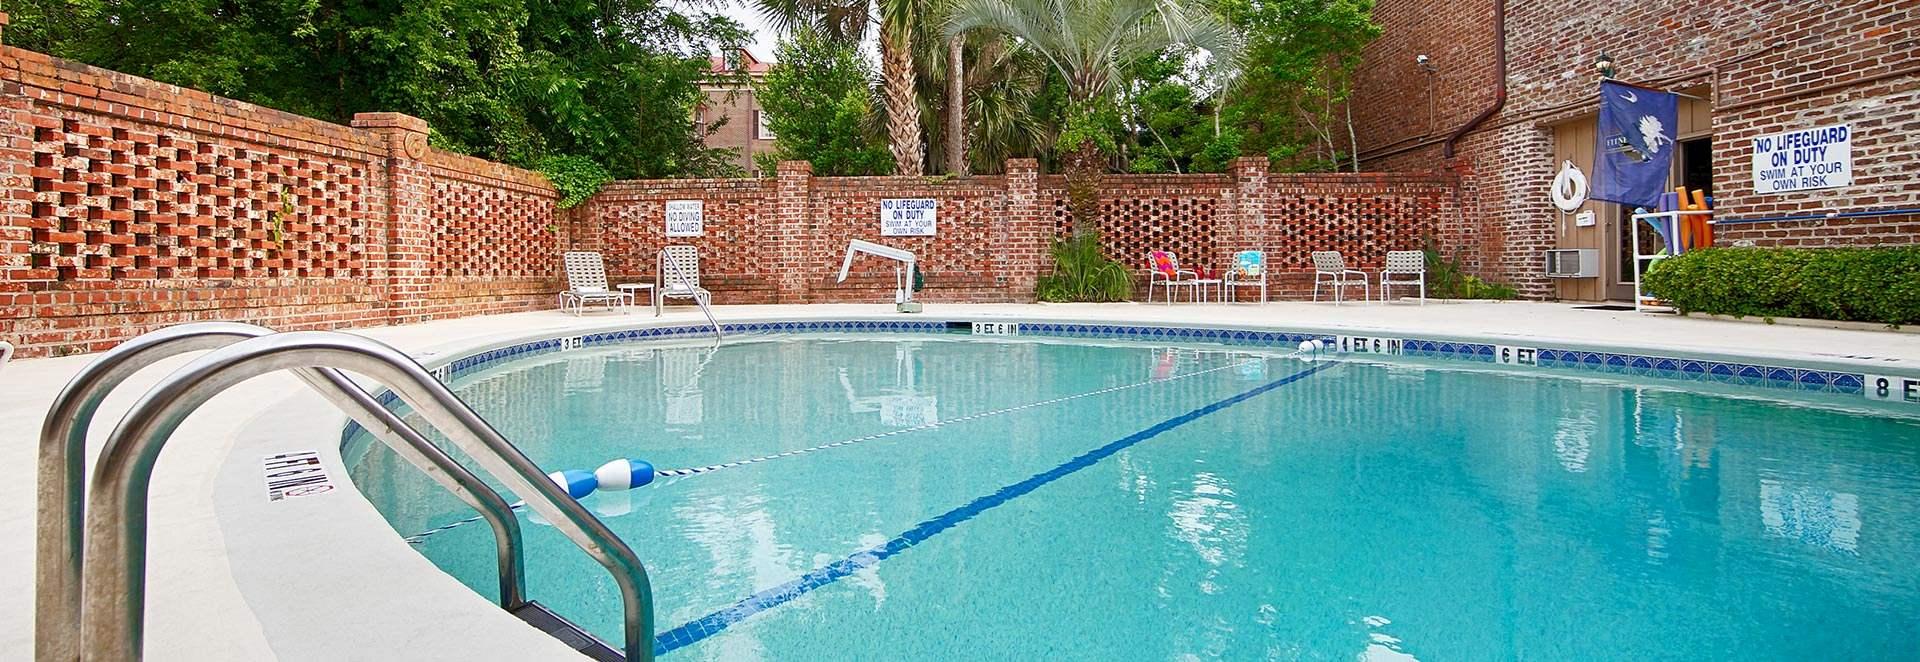 Best Western Sea Island Inn, Beaufort, South Carolina